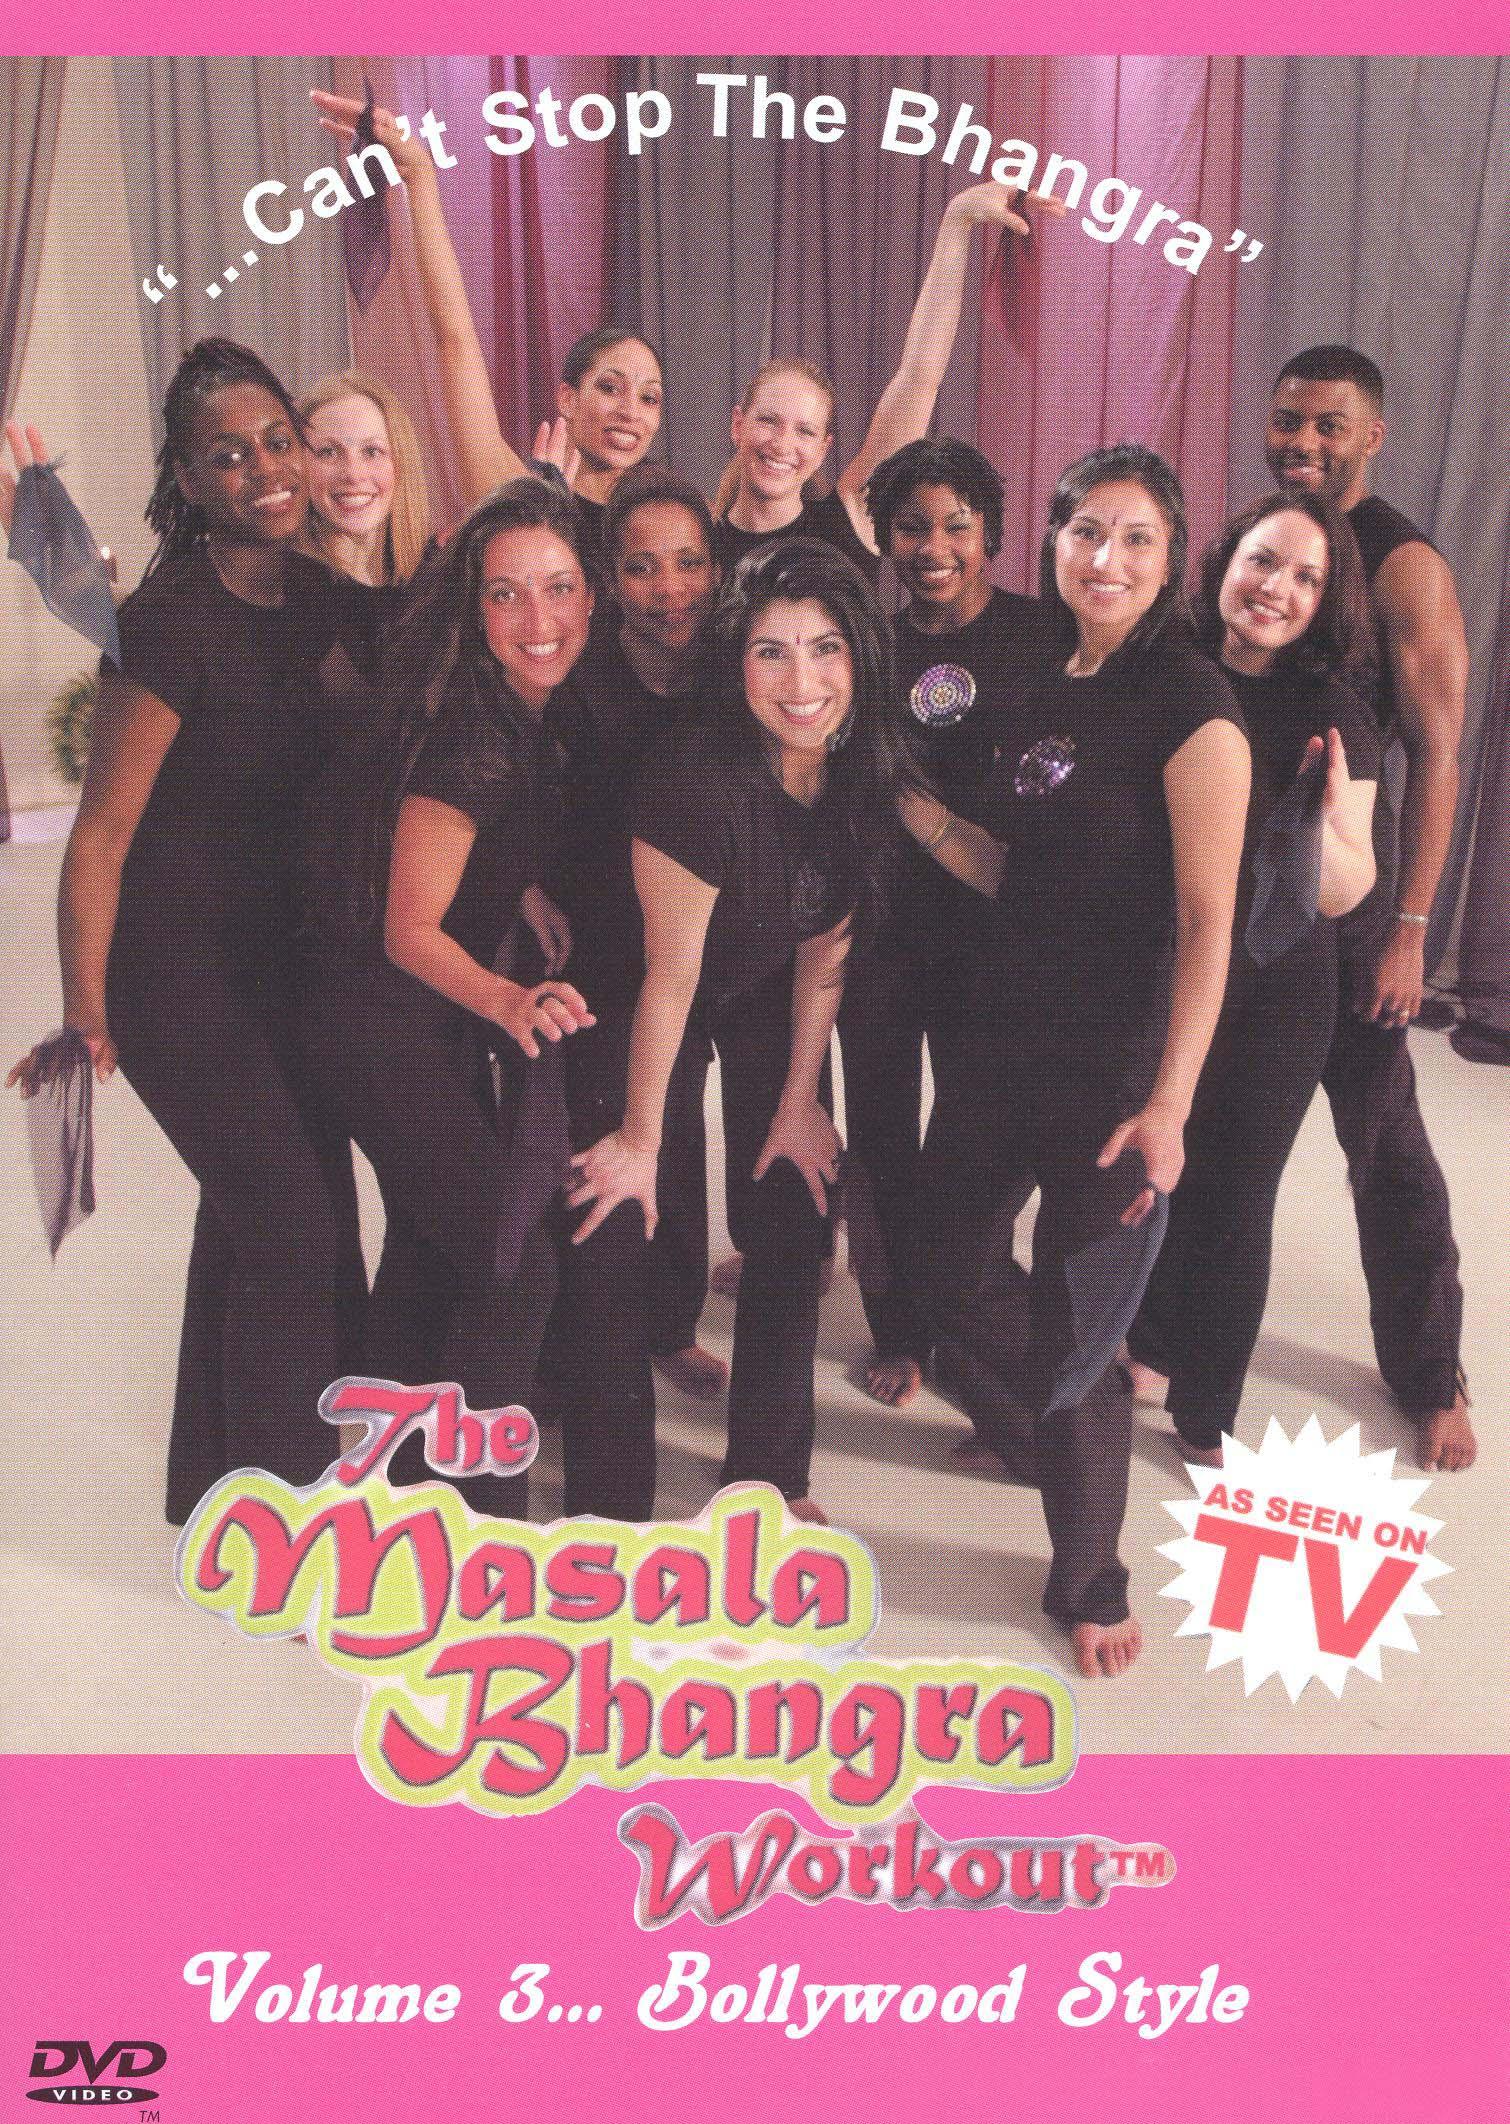 Masala Bhangra Workout, Vol. 3: Bollywood Style